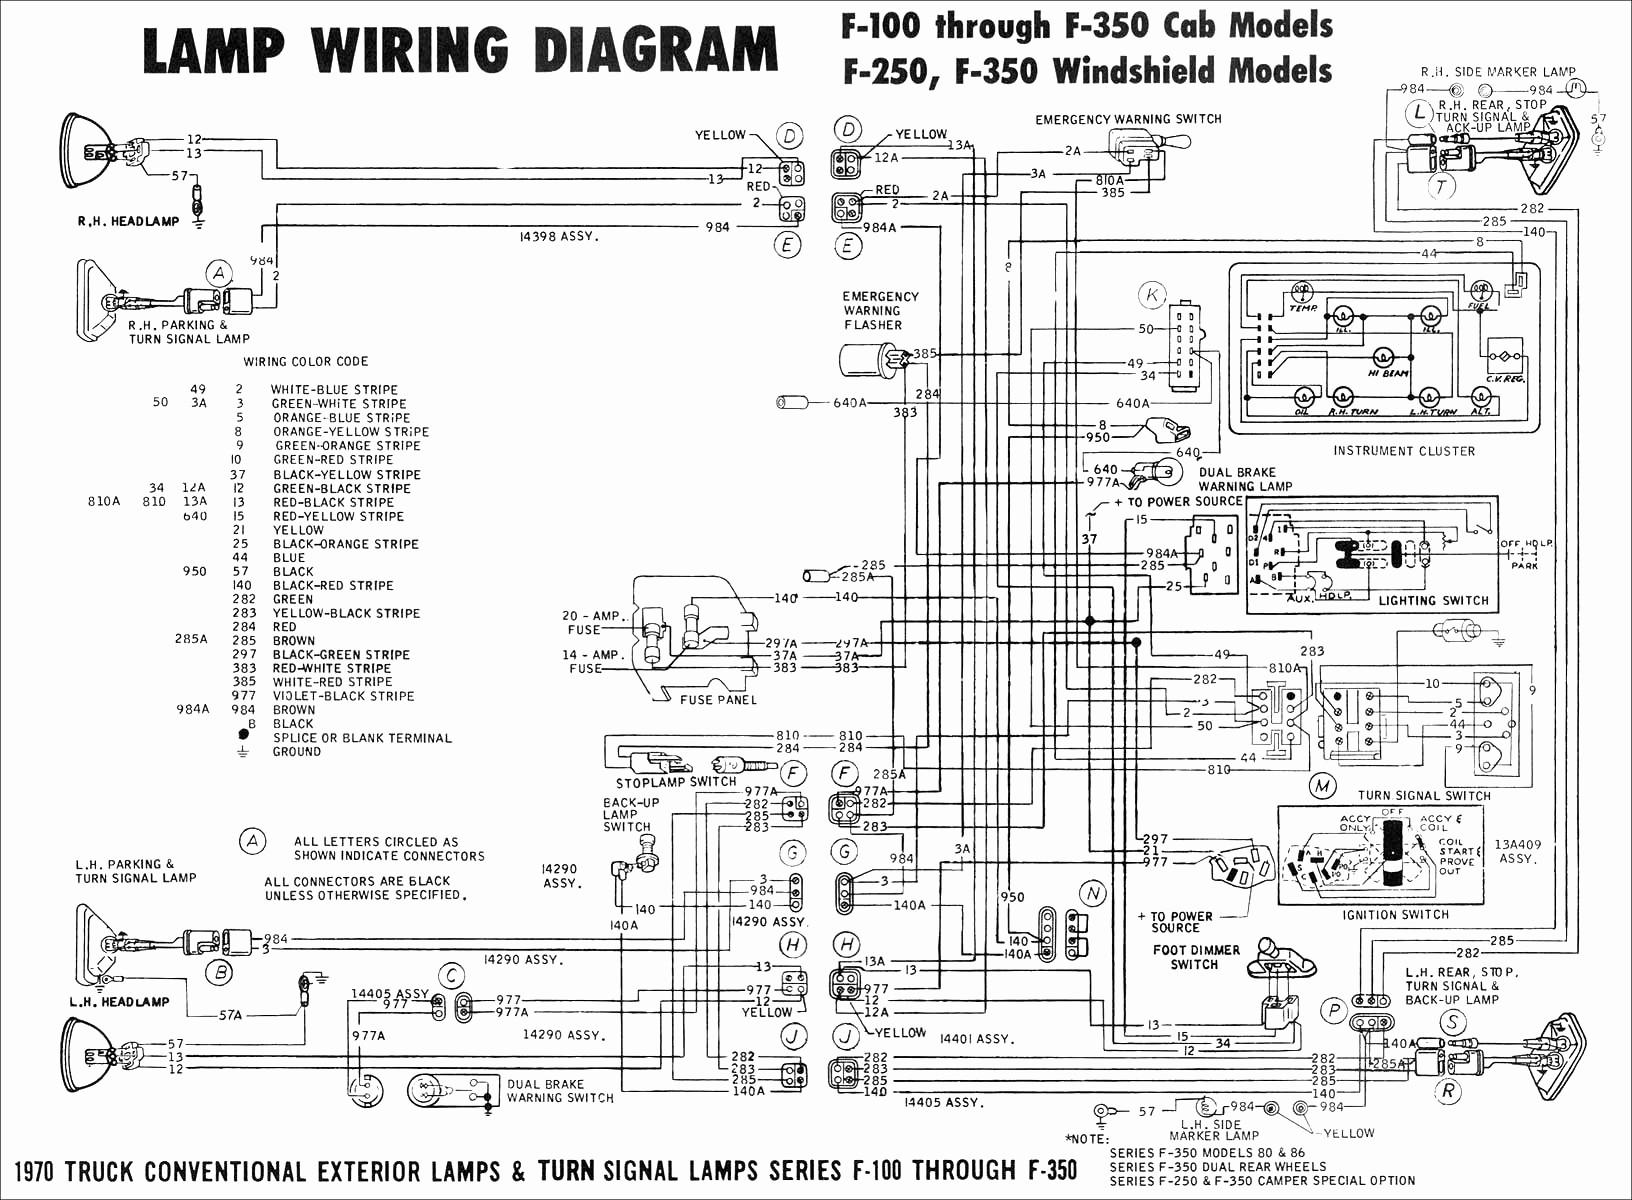 True Tac 48 Wiring Diagram - 4 3 L Vortec Engine Diagram | Bege Wiring  Diagram | True Tac 48 Wiring Diagram |  | Bege Place Wiring Diagram